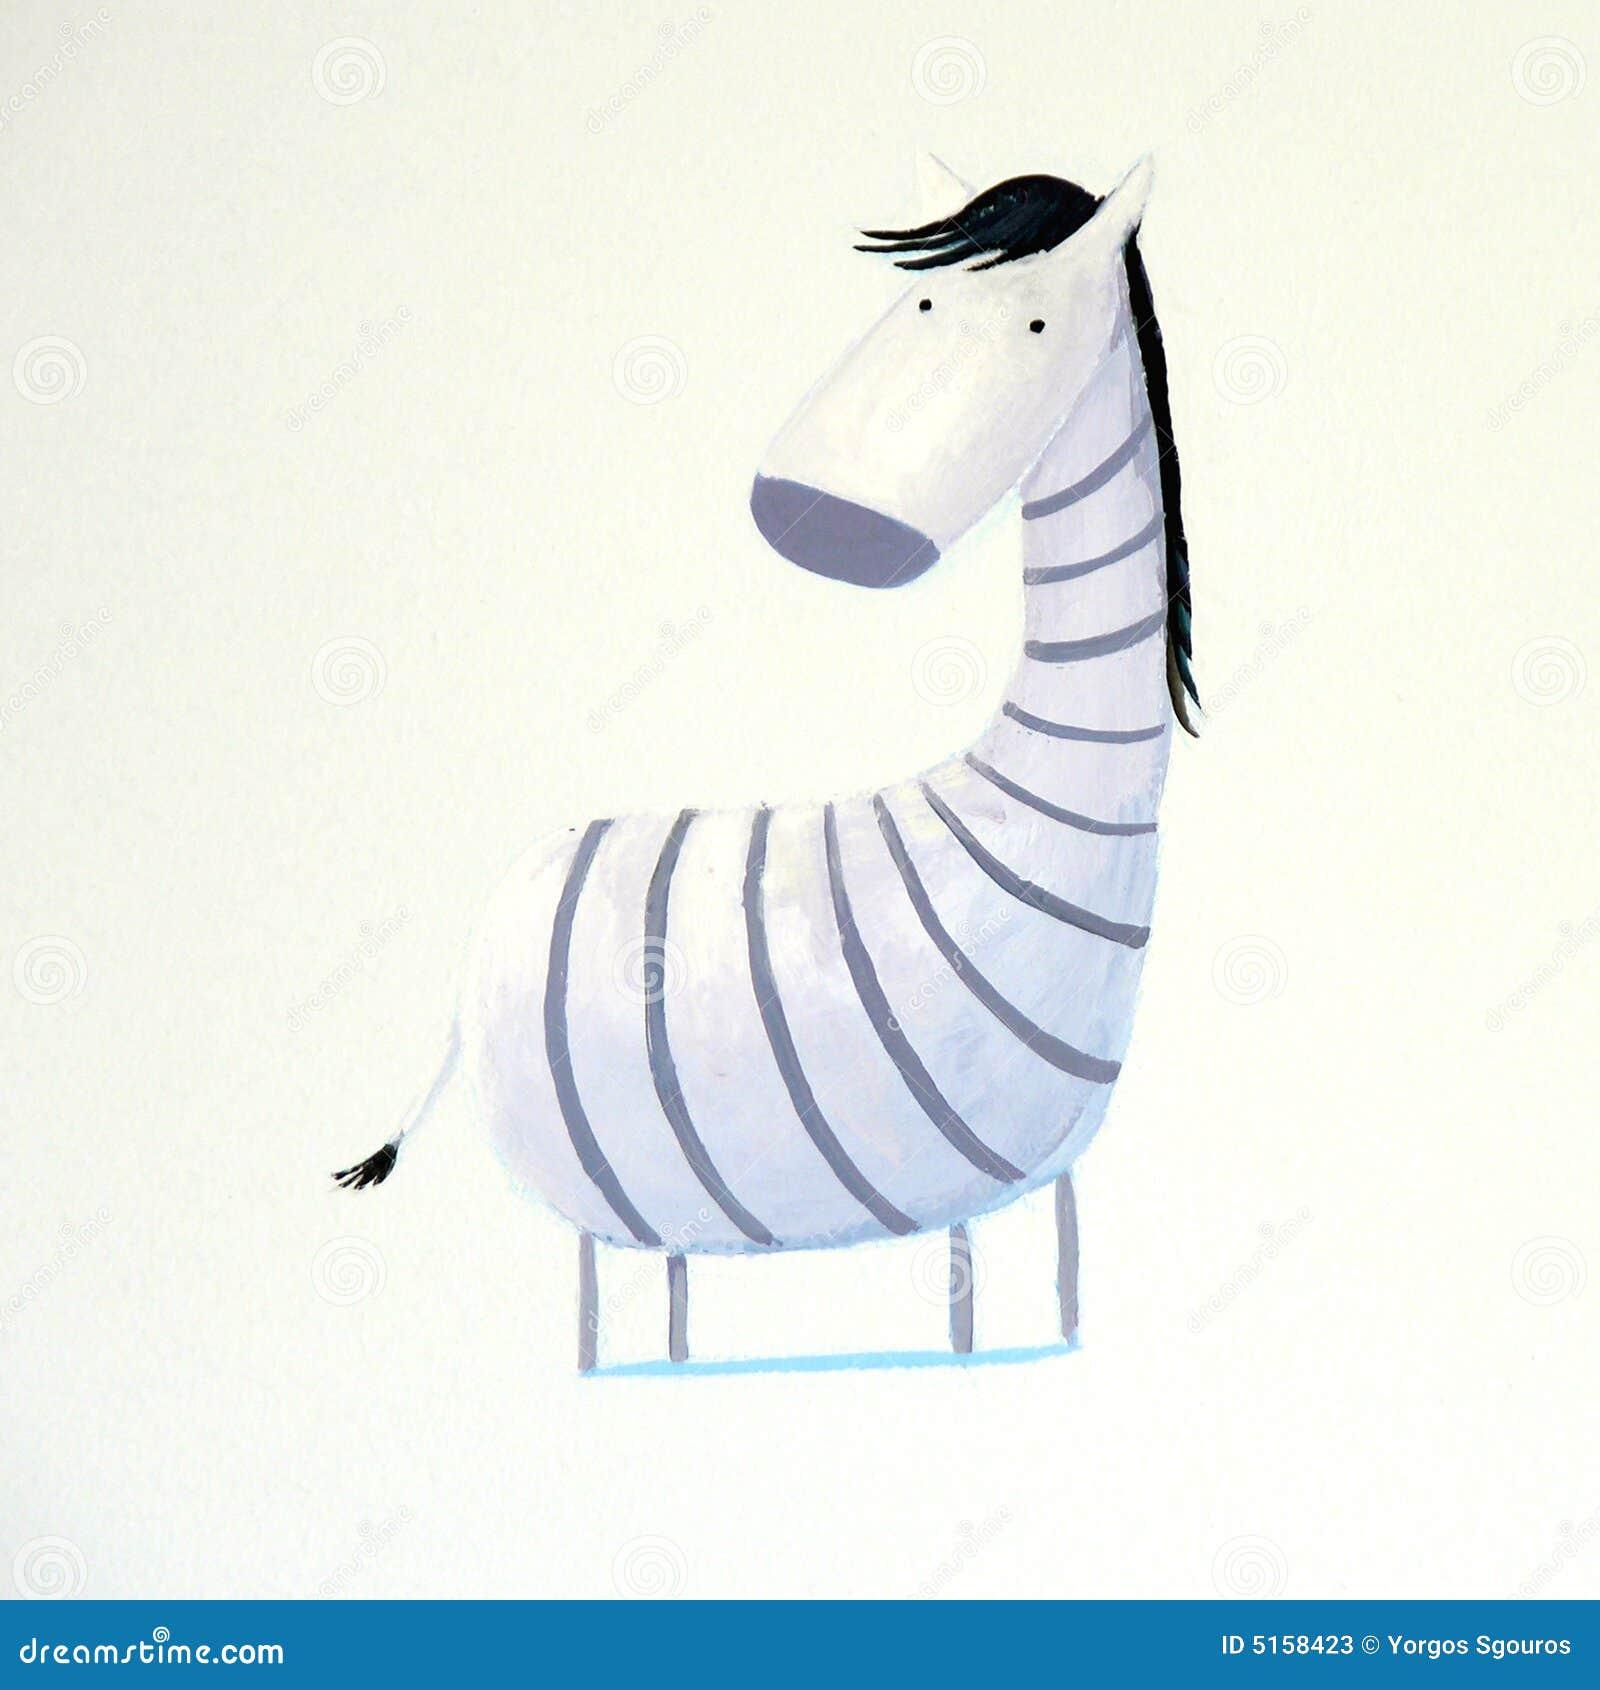 Abstract baby zebra